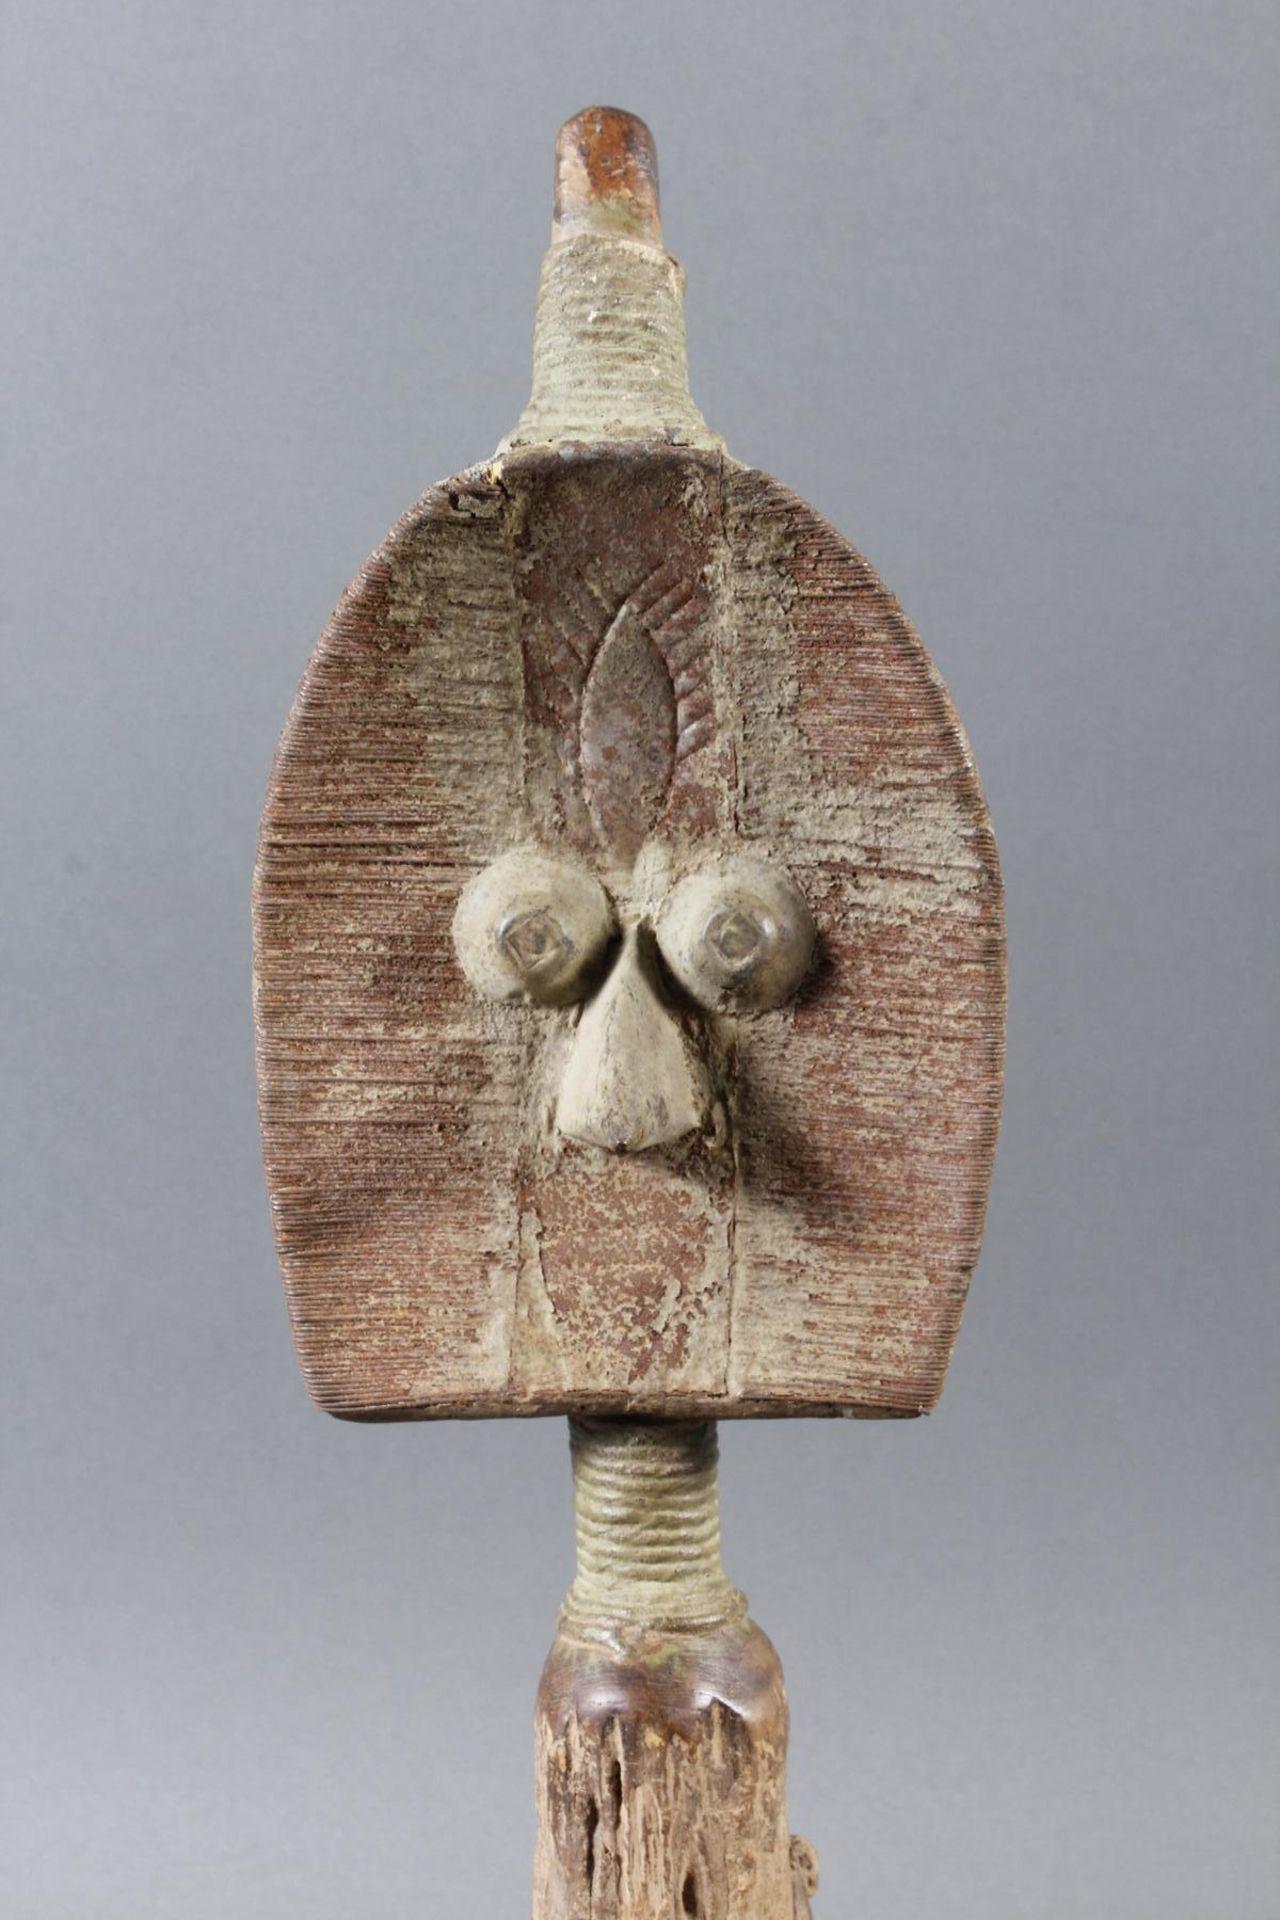 Grabwächter, Reliquiarfigur, Mahongwe / Gabun - Bild 2 aus 7